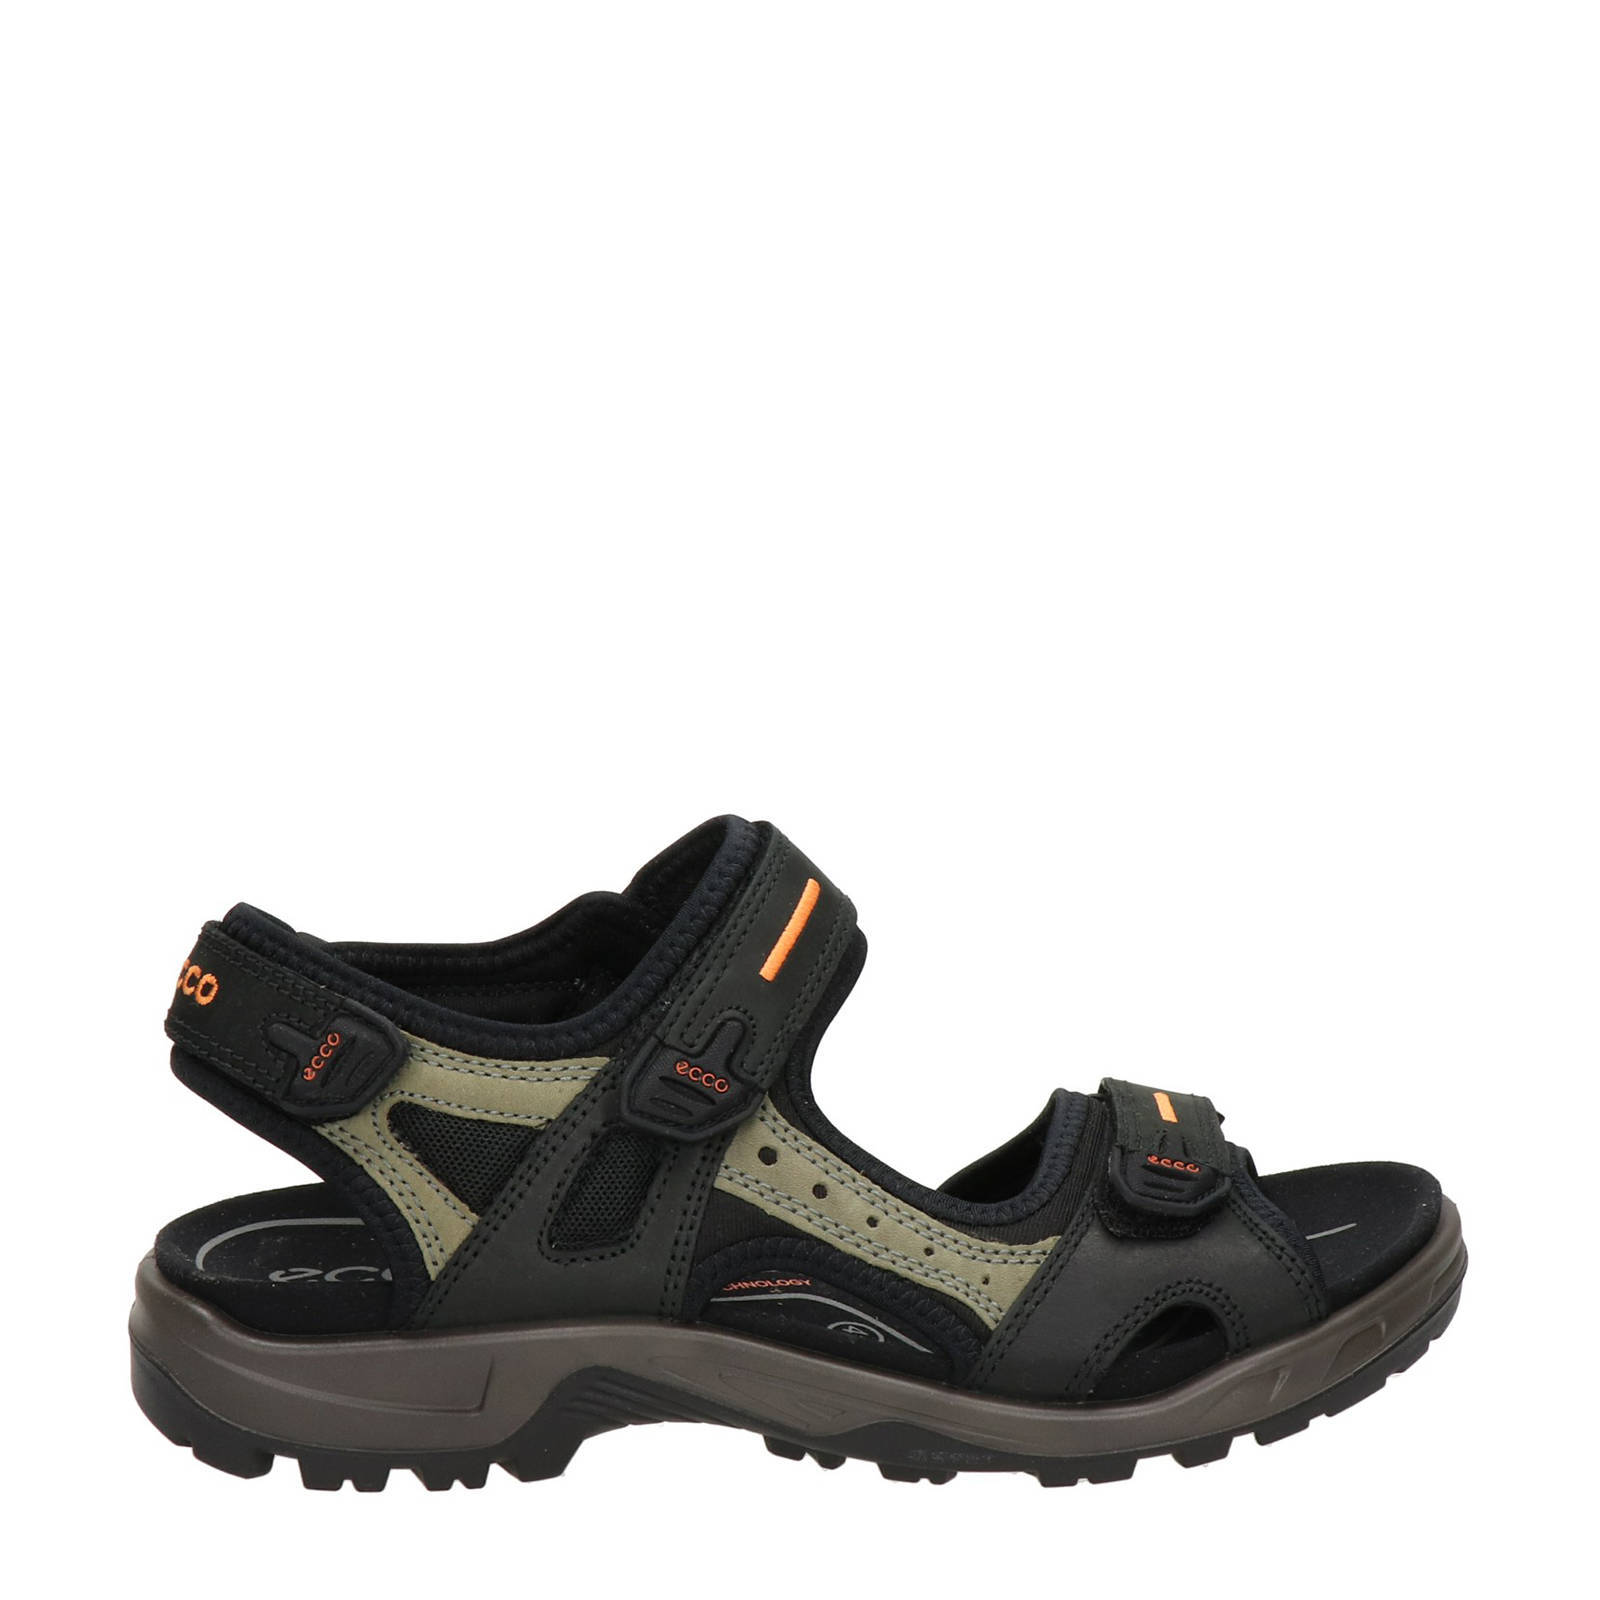 ecco sandals for, ECCO Offroad Sport Outdoor Sandals